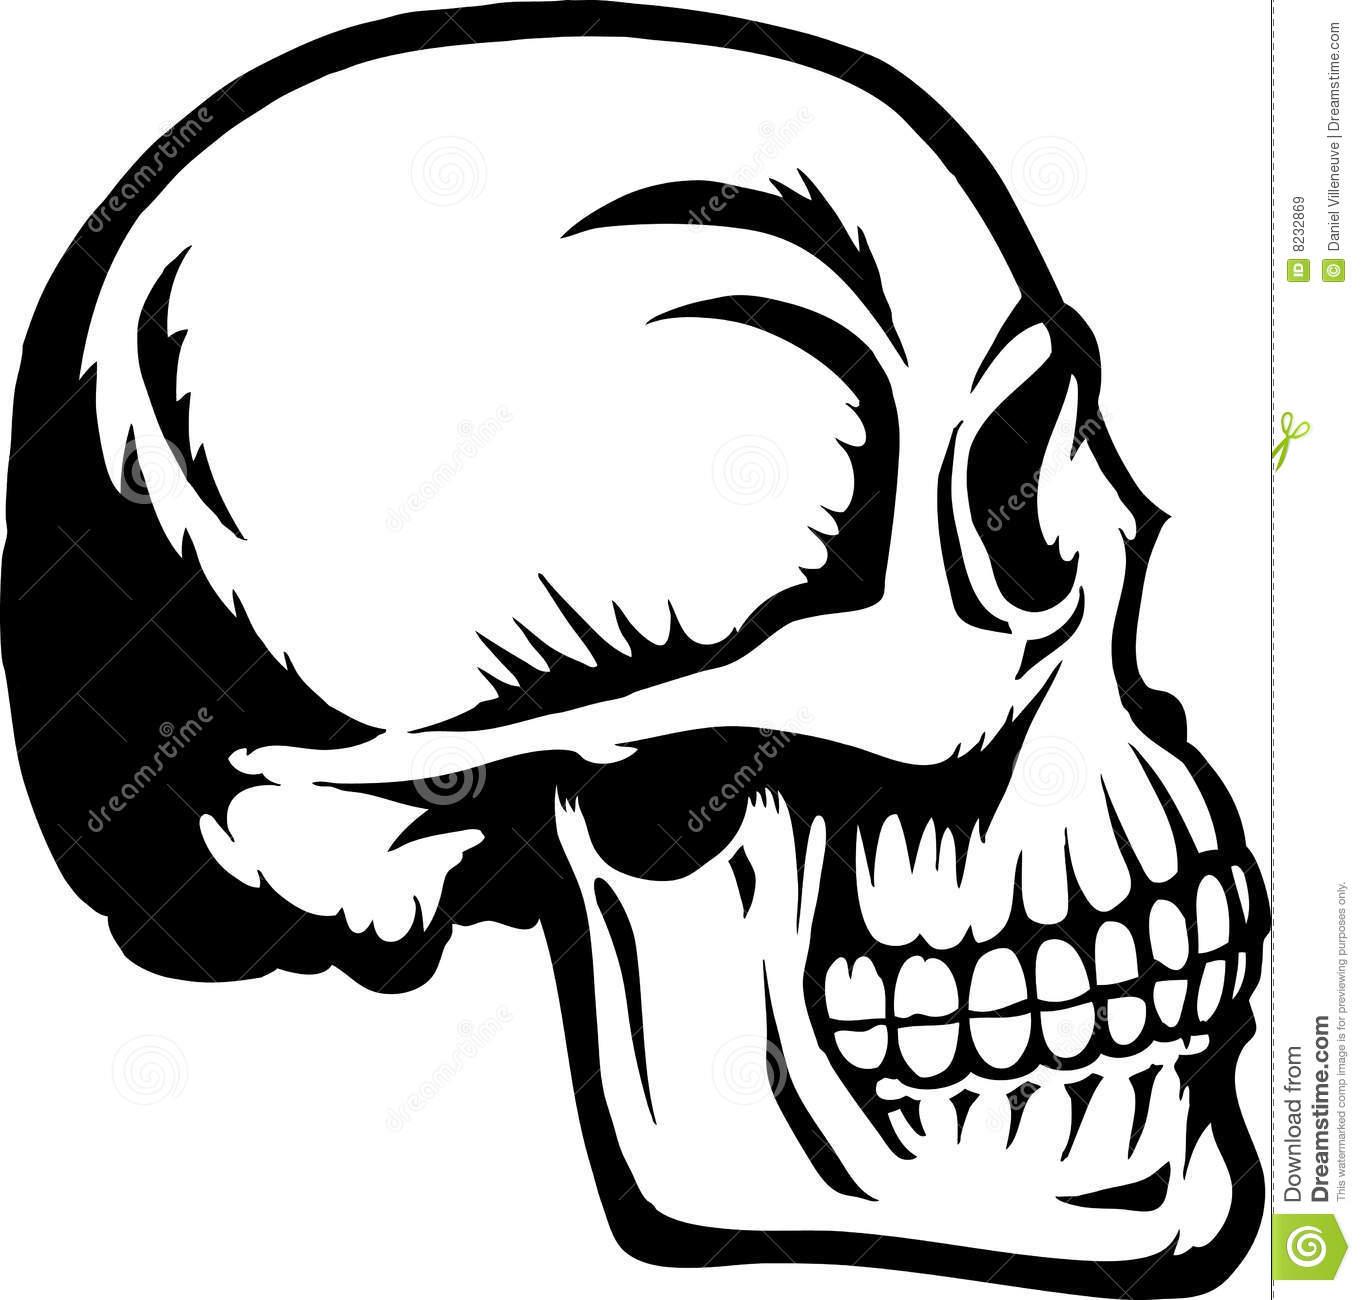 Skull profile clipart 3 » Clipart Station.